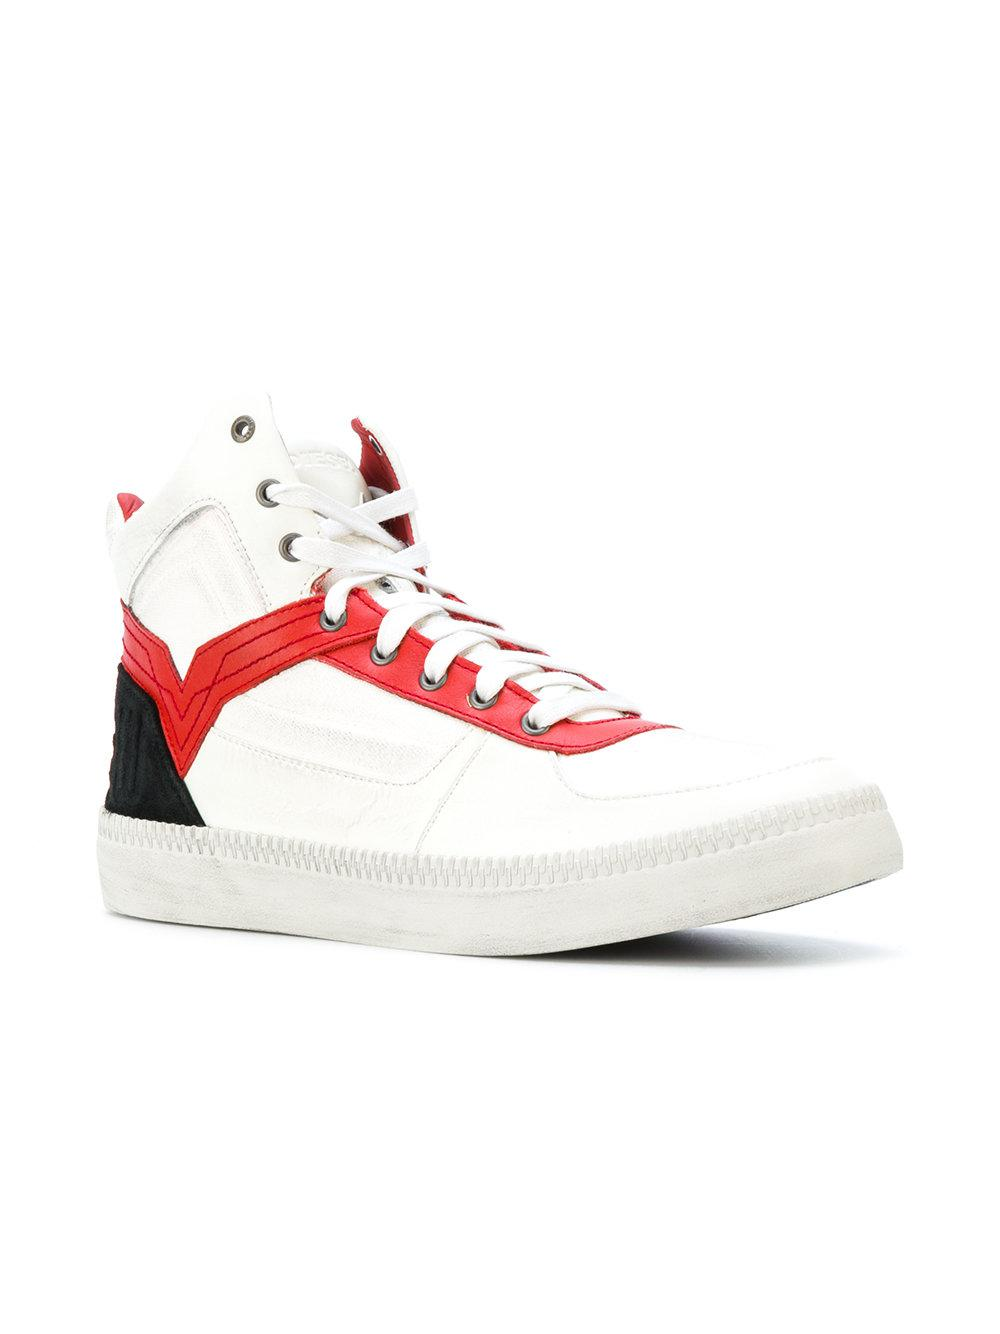 Street Fighter 5 Ryu Sneakers